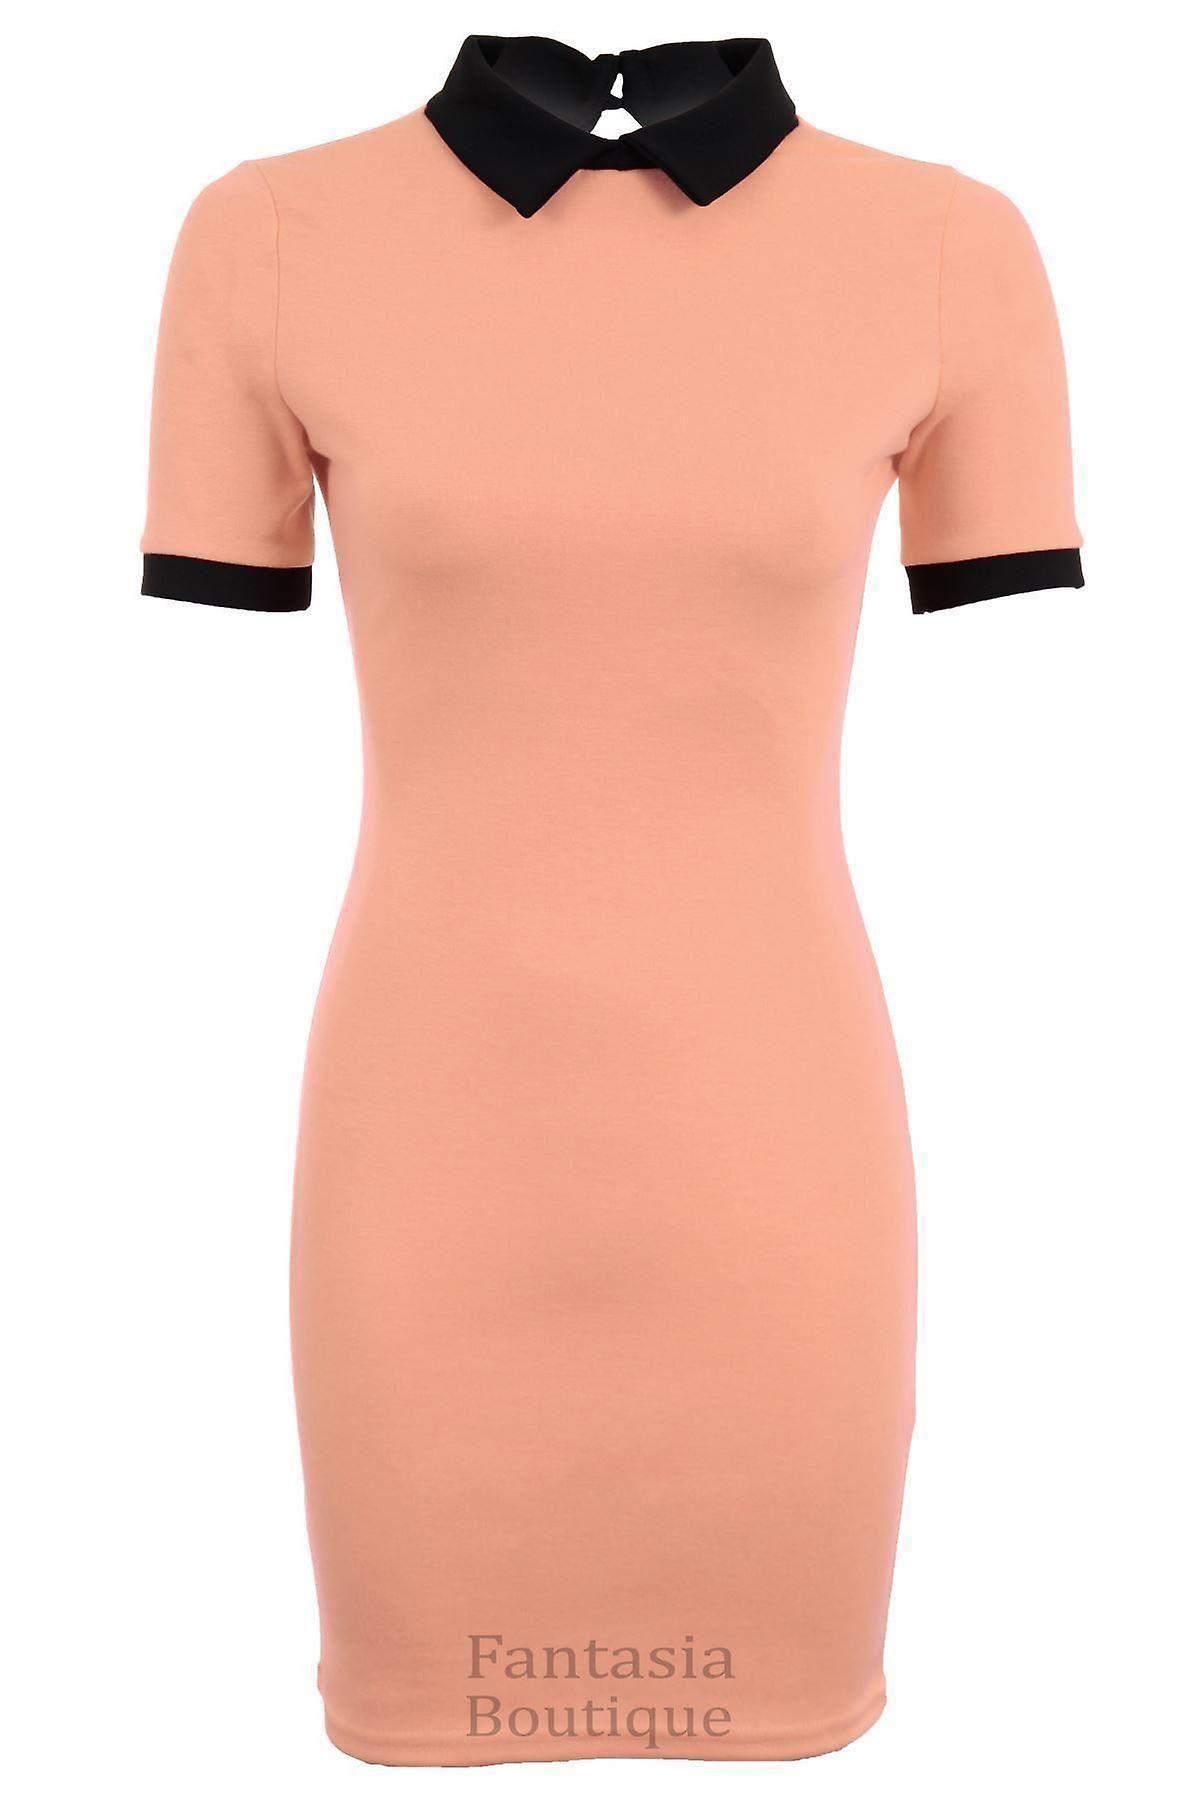 Ladies Short Sleeve Plain Peter Pan Collar Contrast Bodycon Women's Short Dress